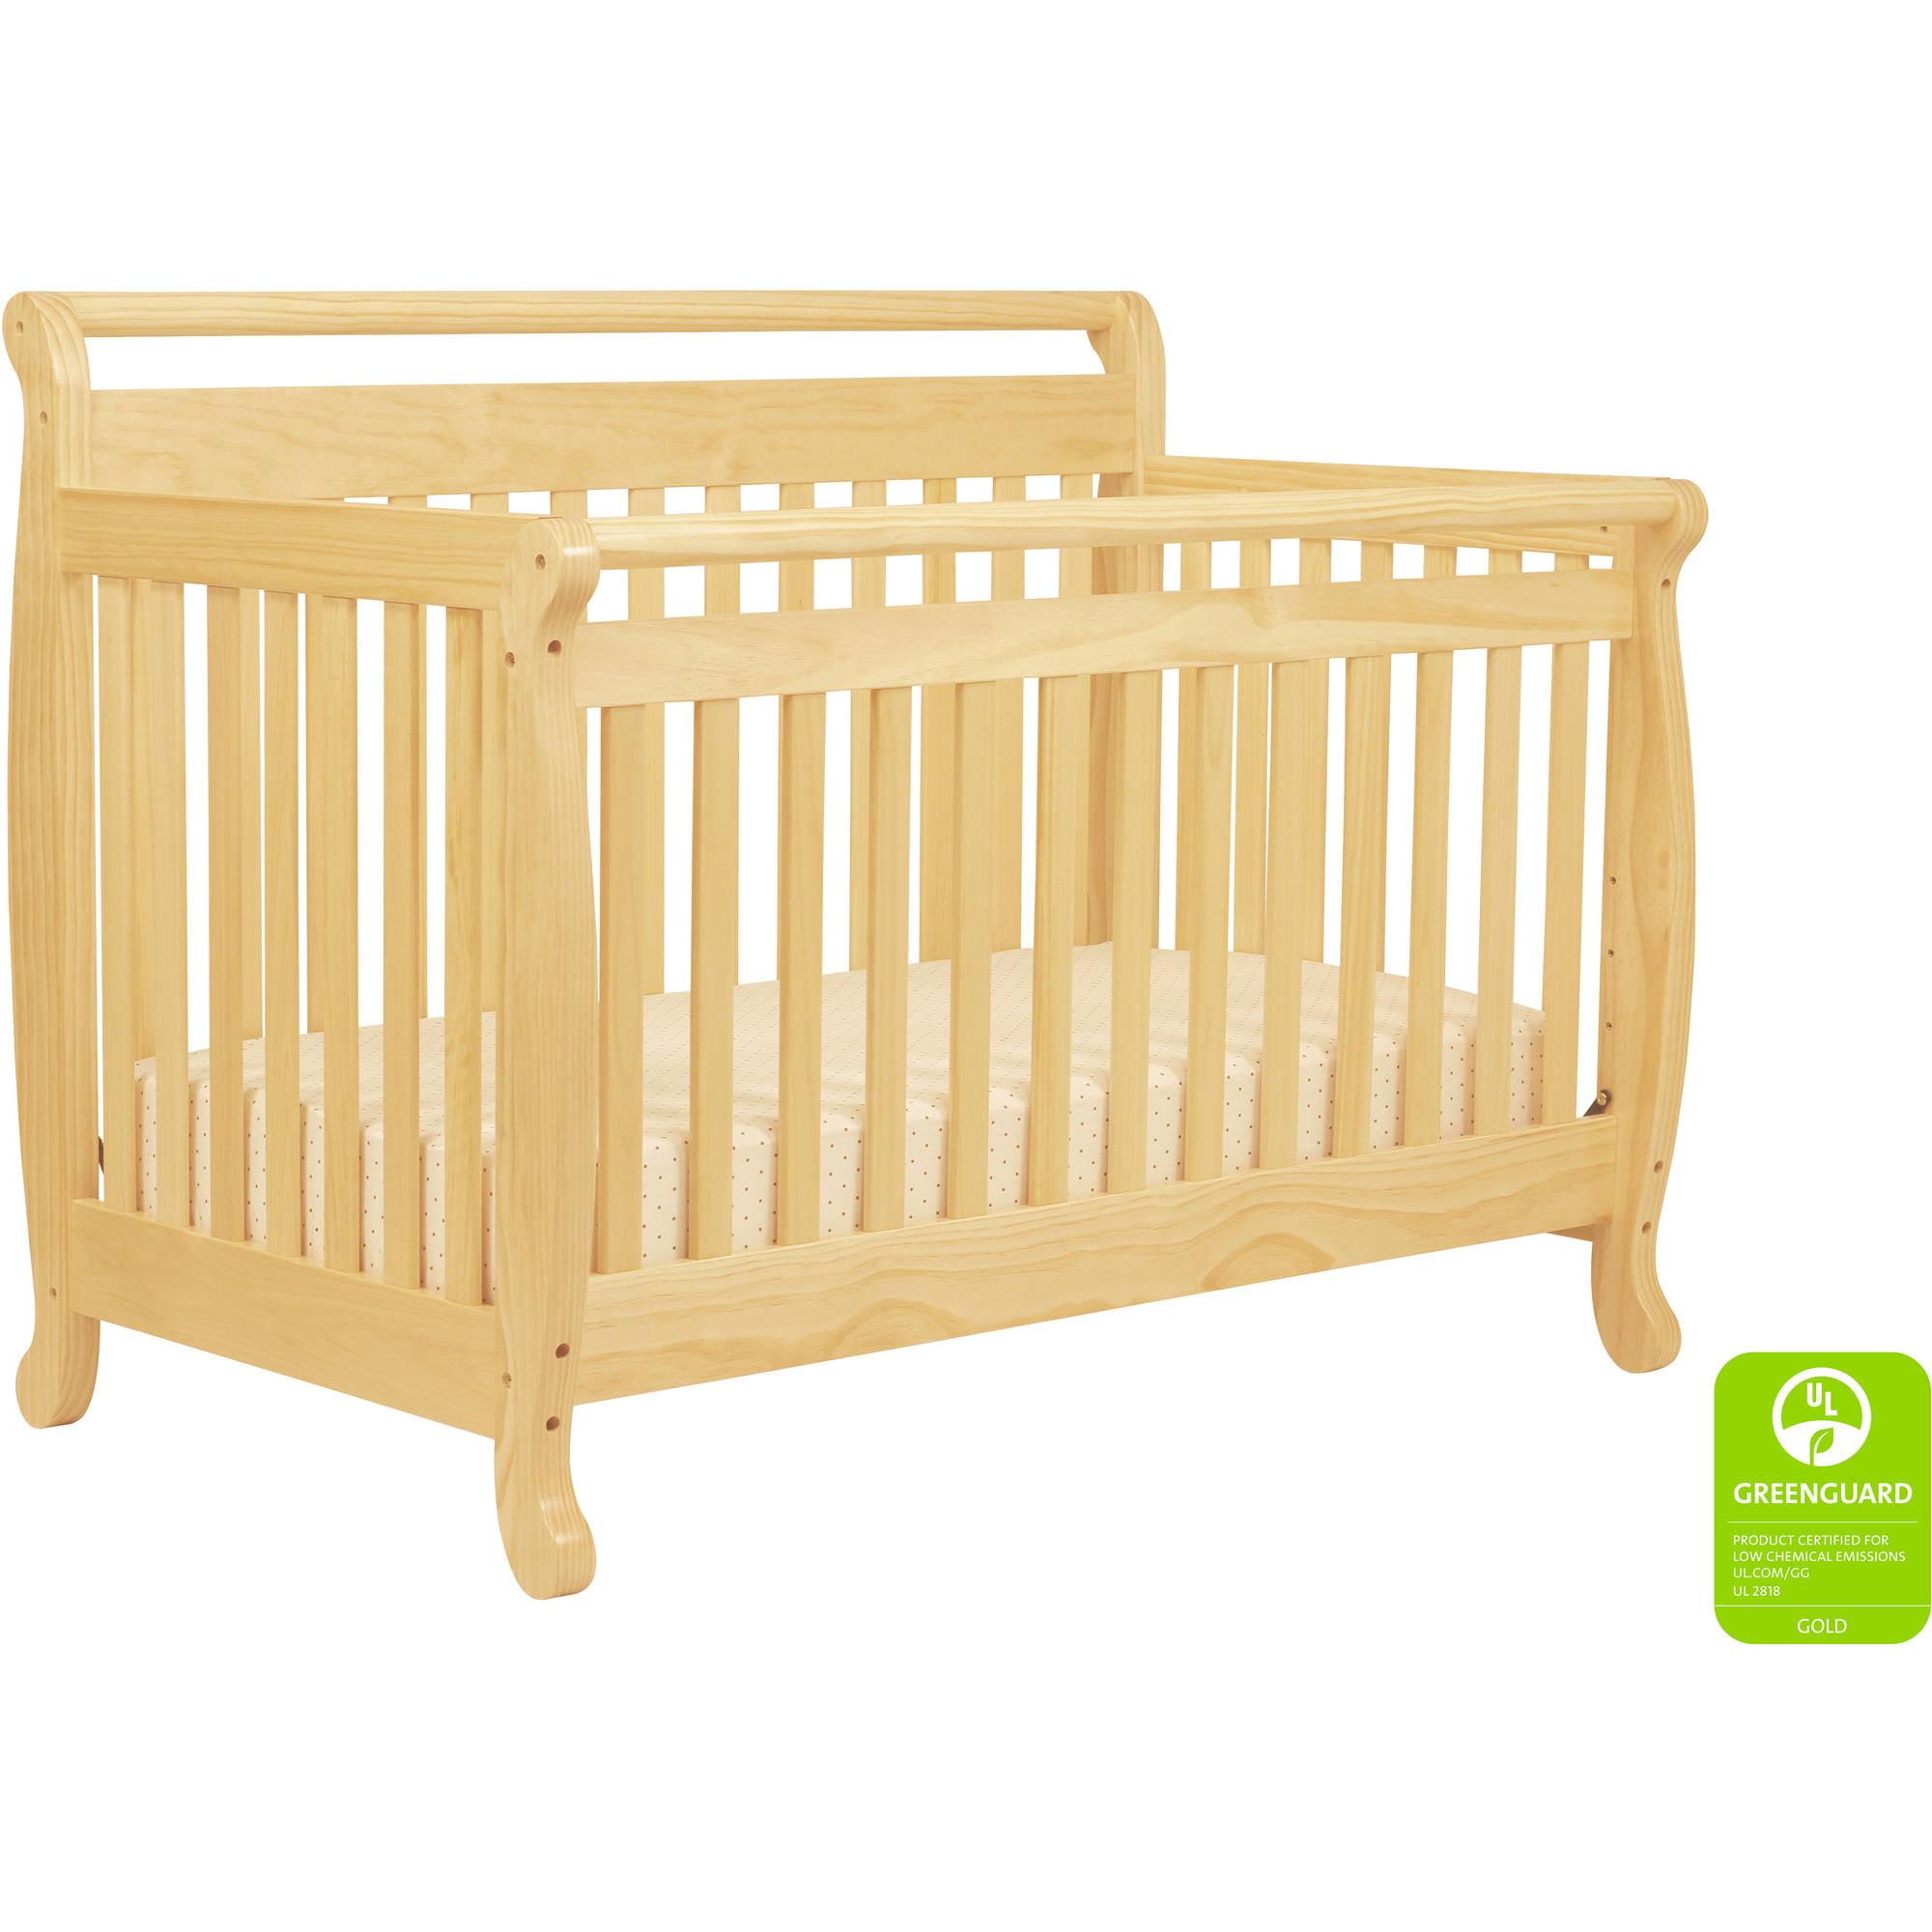 Davinci Emily 4 In 1 Fixed Side Convertible Crib Natural Walmart Com Walmart Com